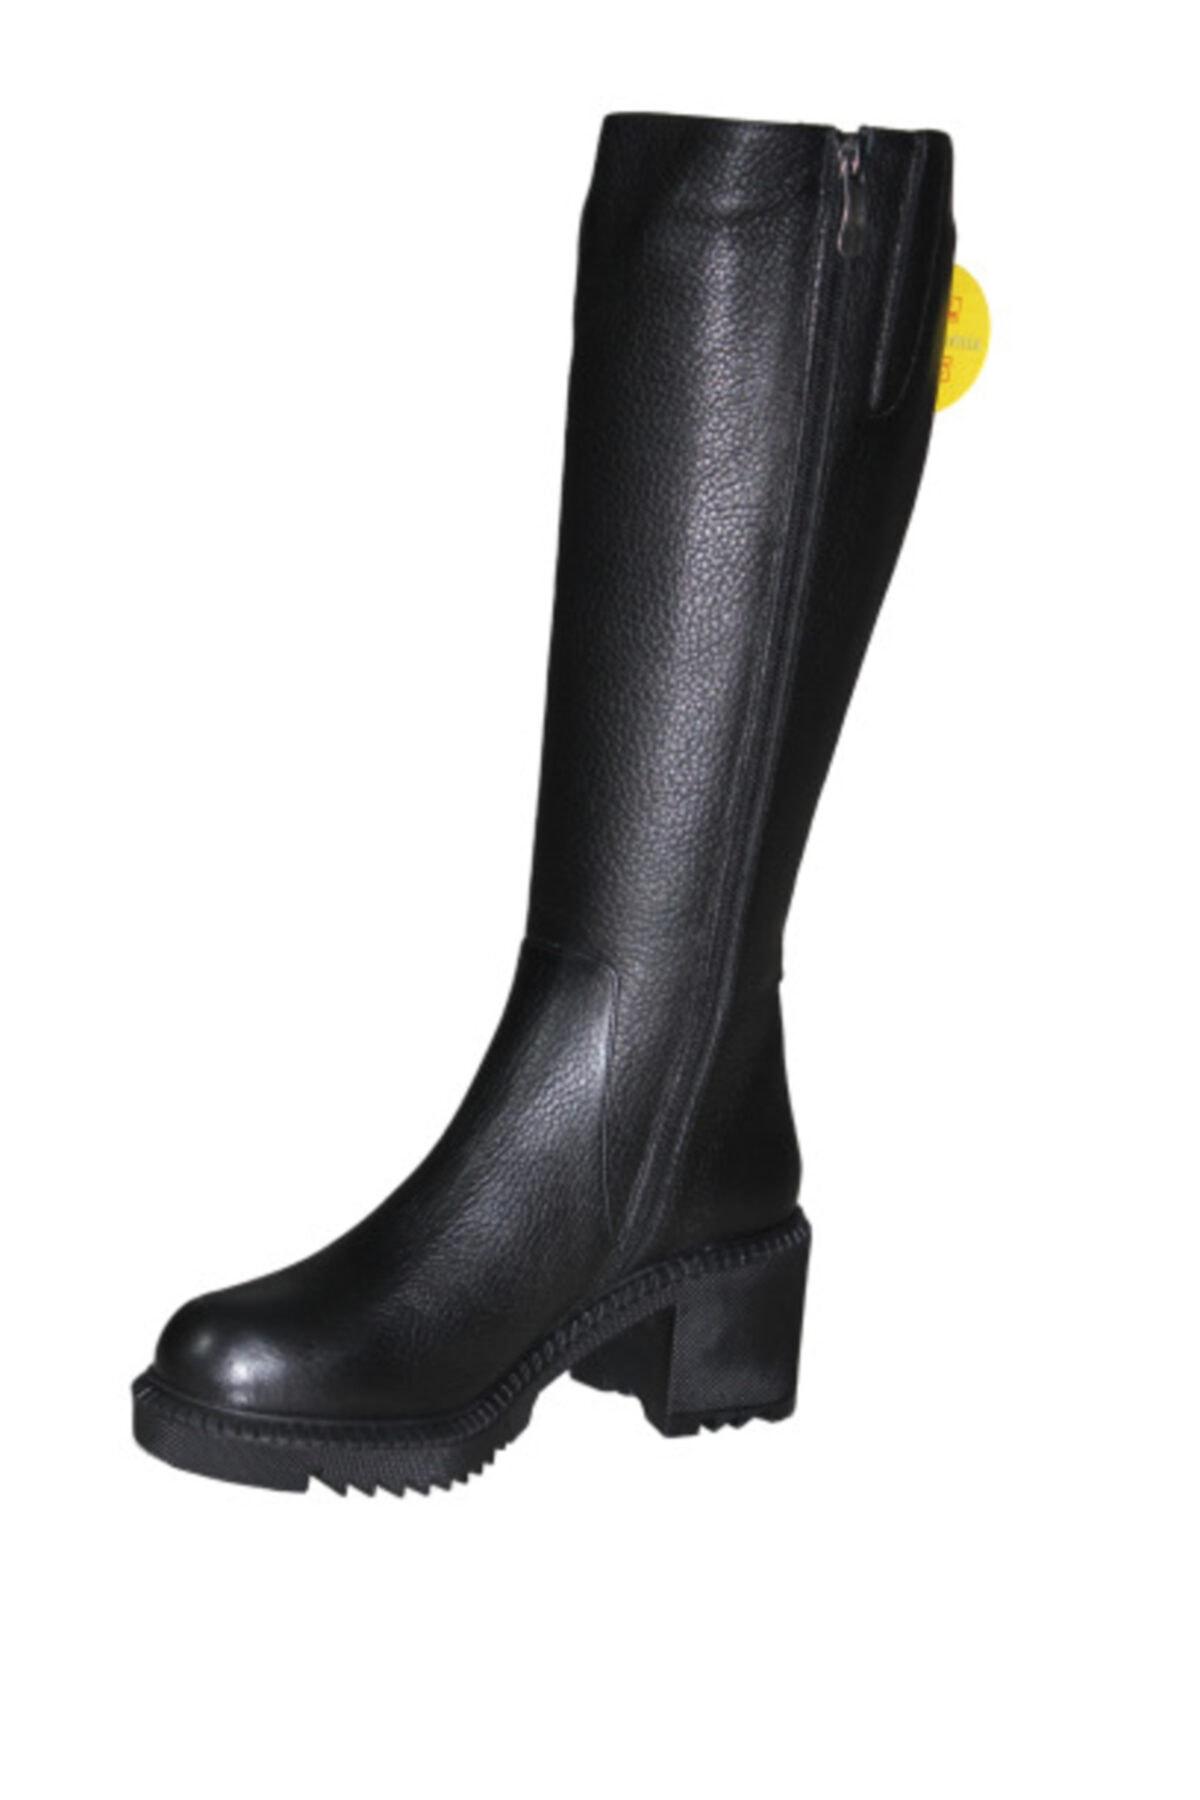 Mammamia D19kc-2065 Hakiki Deri Kadın Çizme - - Siyah - 39 2